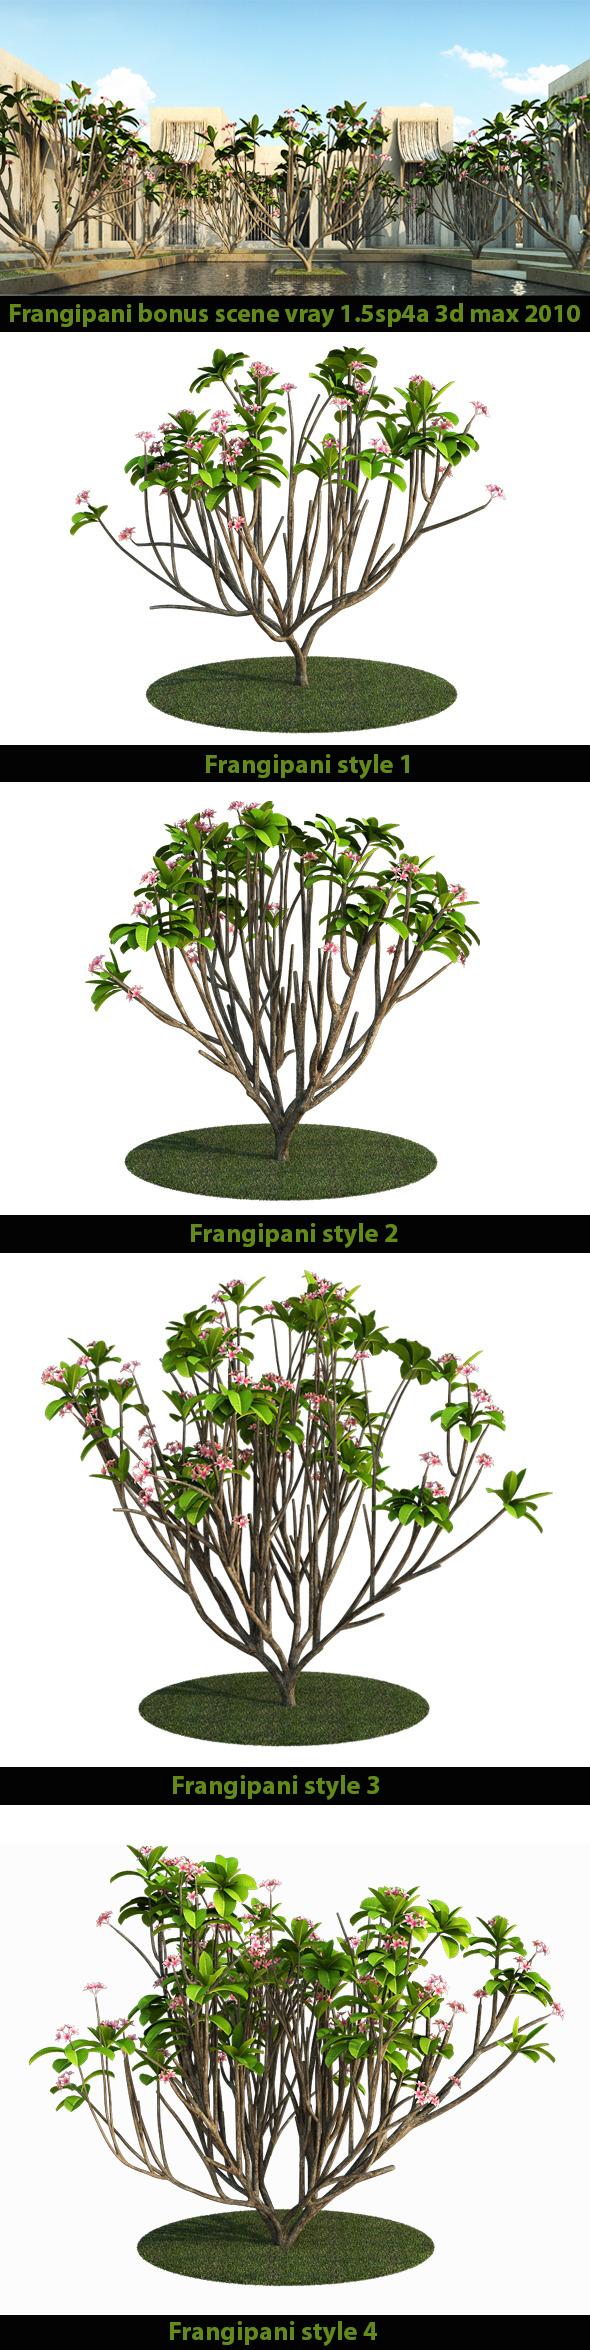 3DOcean Frangipani Tree v.2 7185729